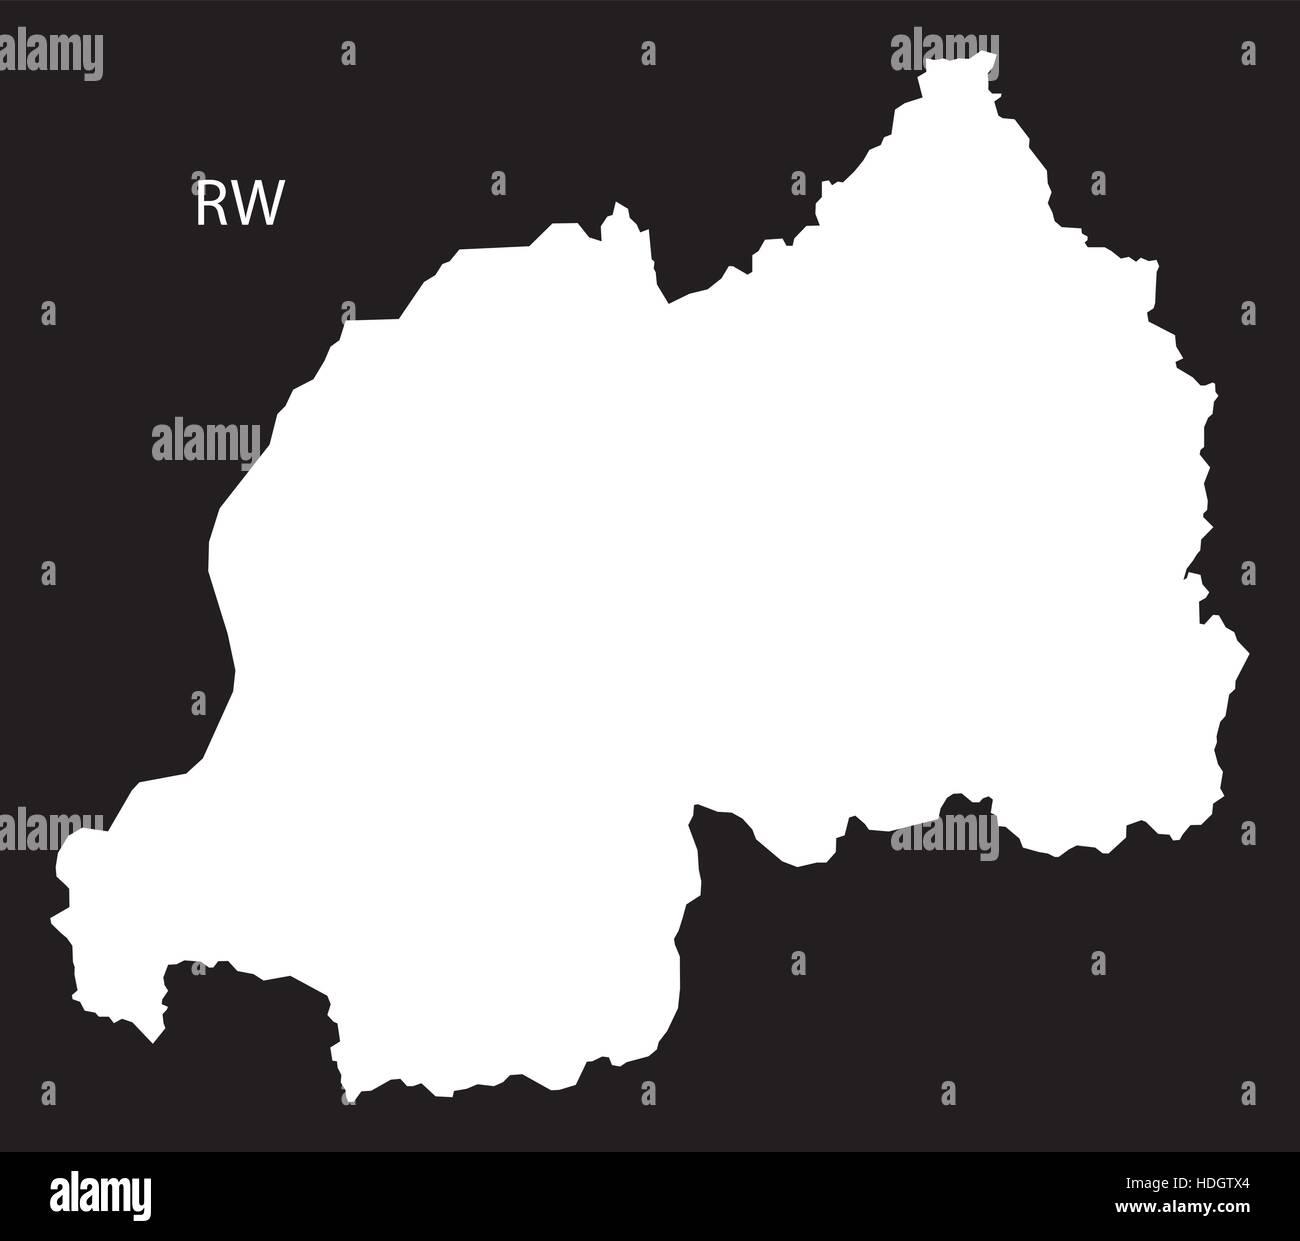 Rwanda Map black and white illustration - Stock Vector